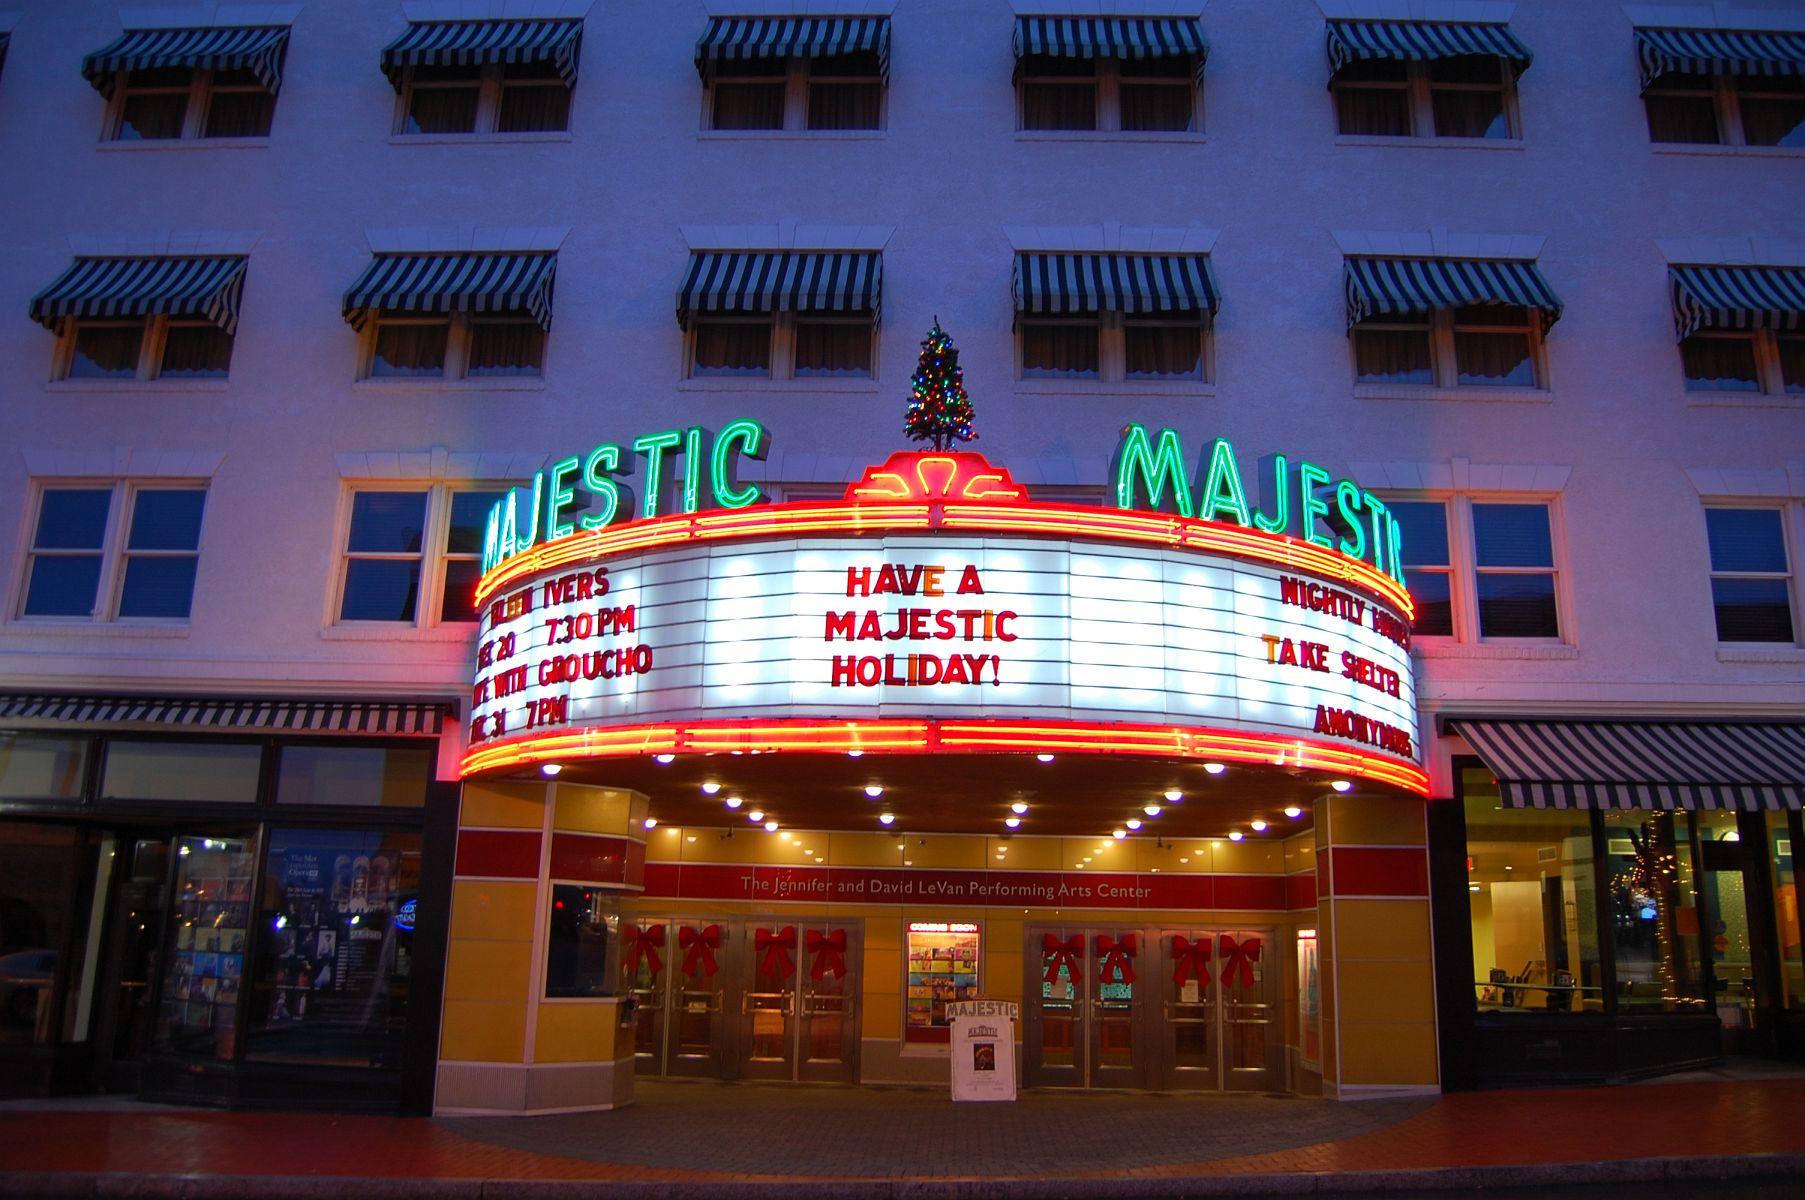 Majestic Theatre Dallas Barney Pictures To Pin On